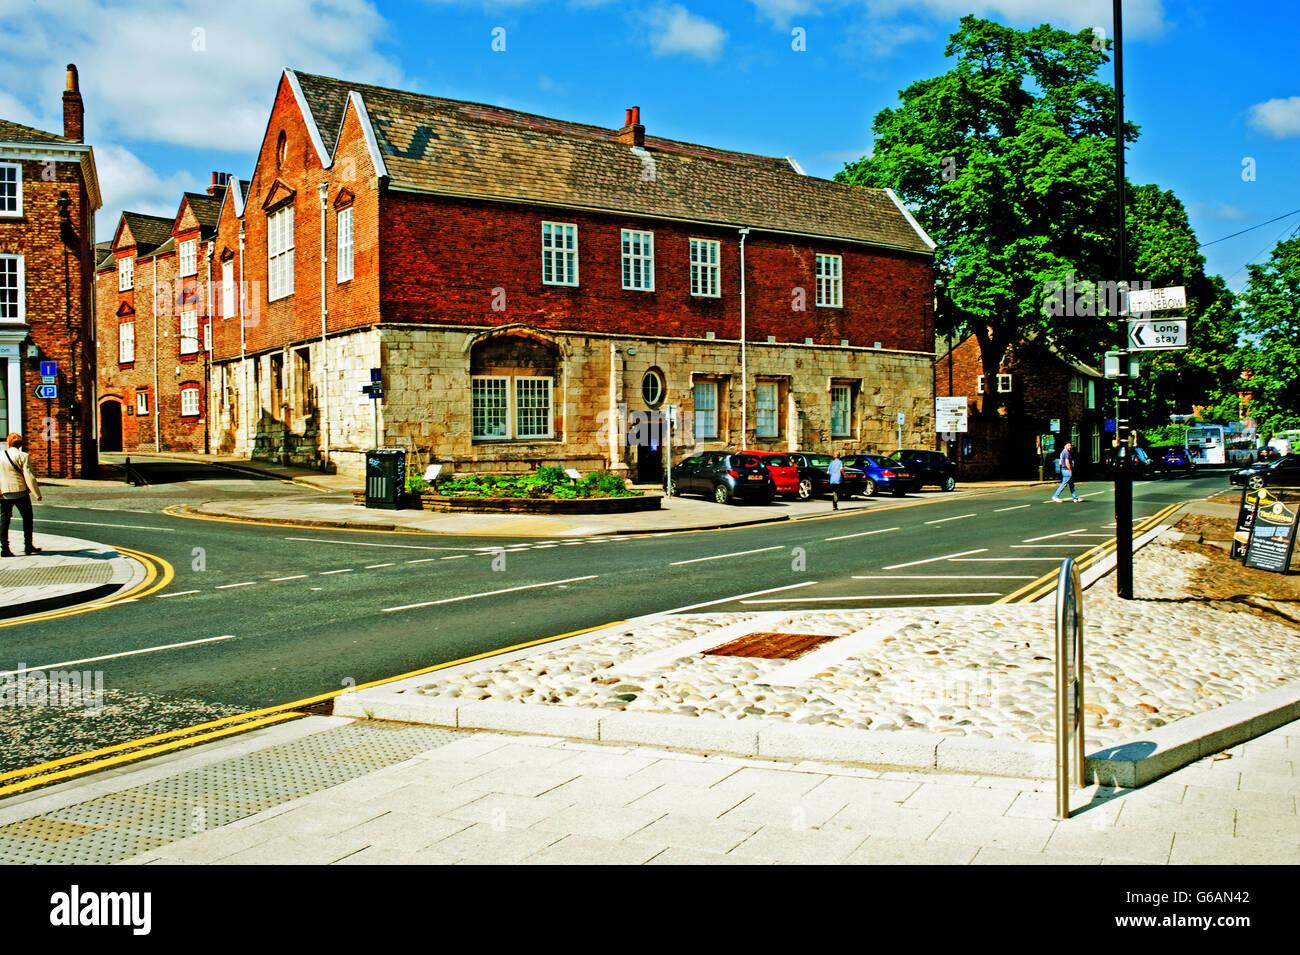 St. Anthonys Hall, Peasholm Green, York - Stock Image